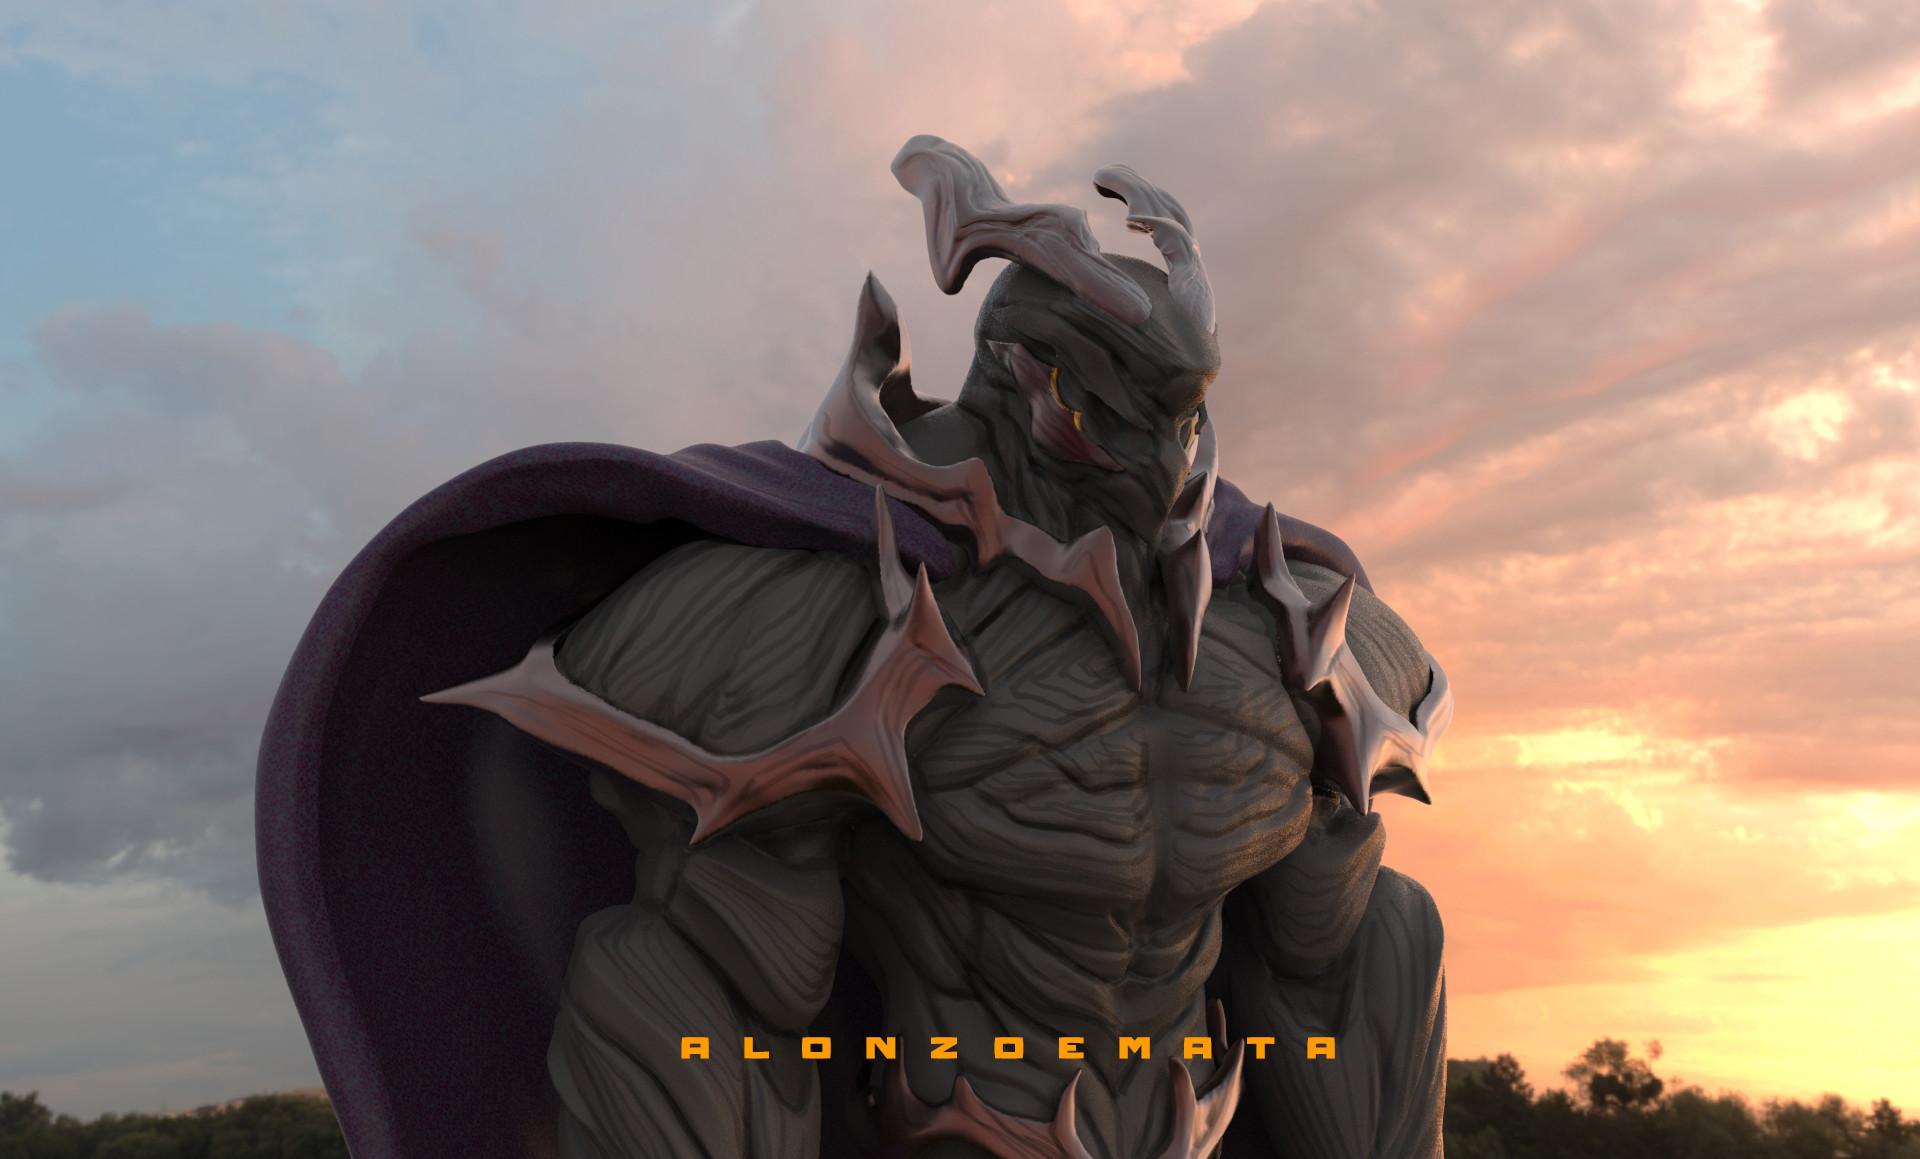 Alonzo emata kingsglaive 002a